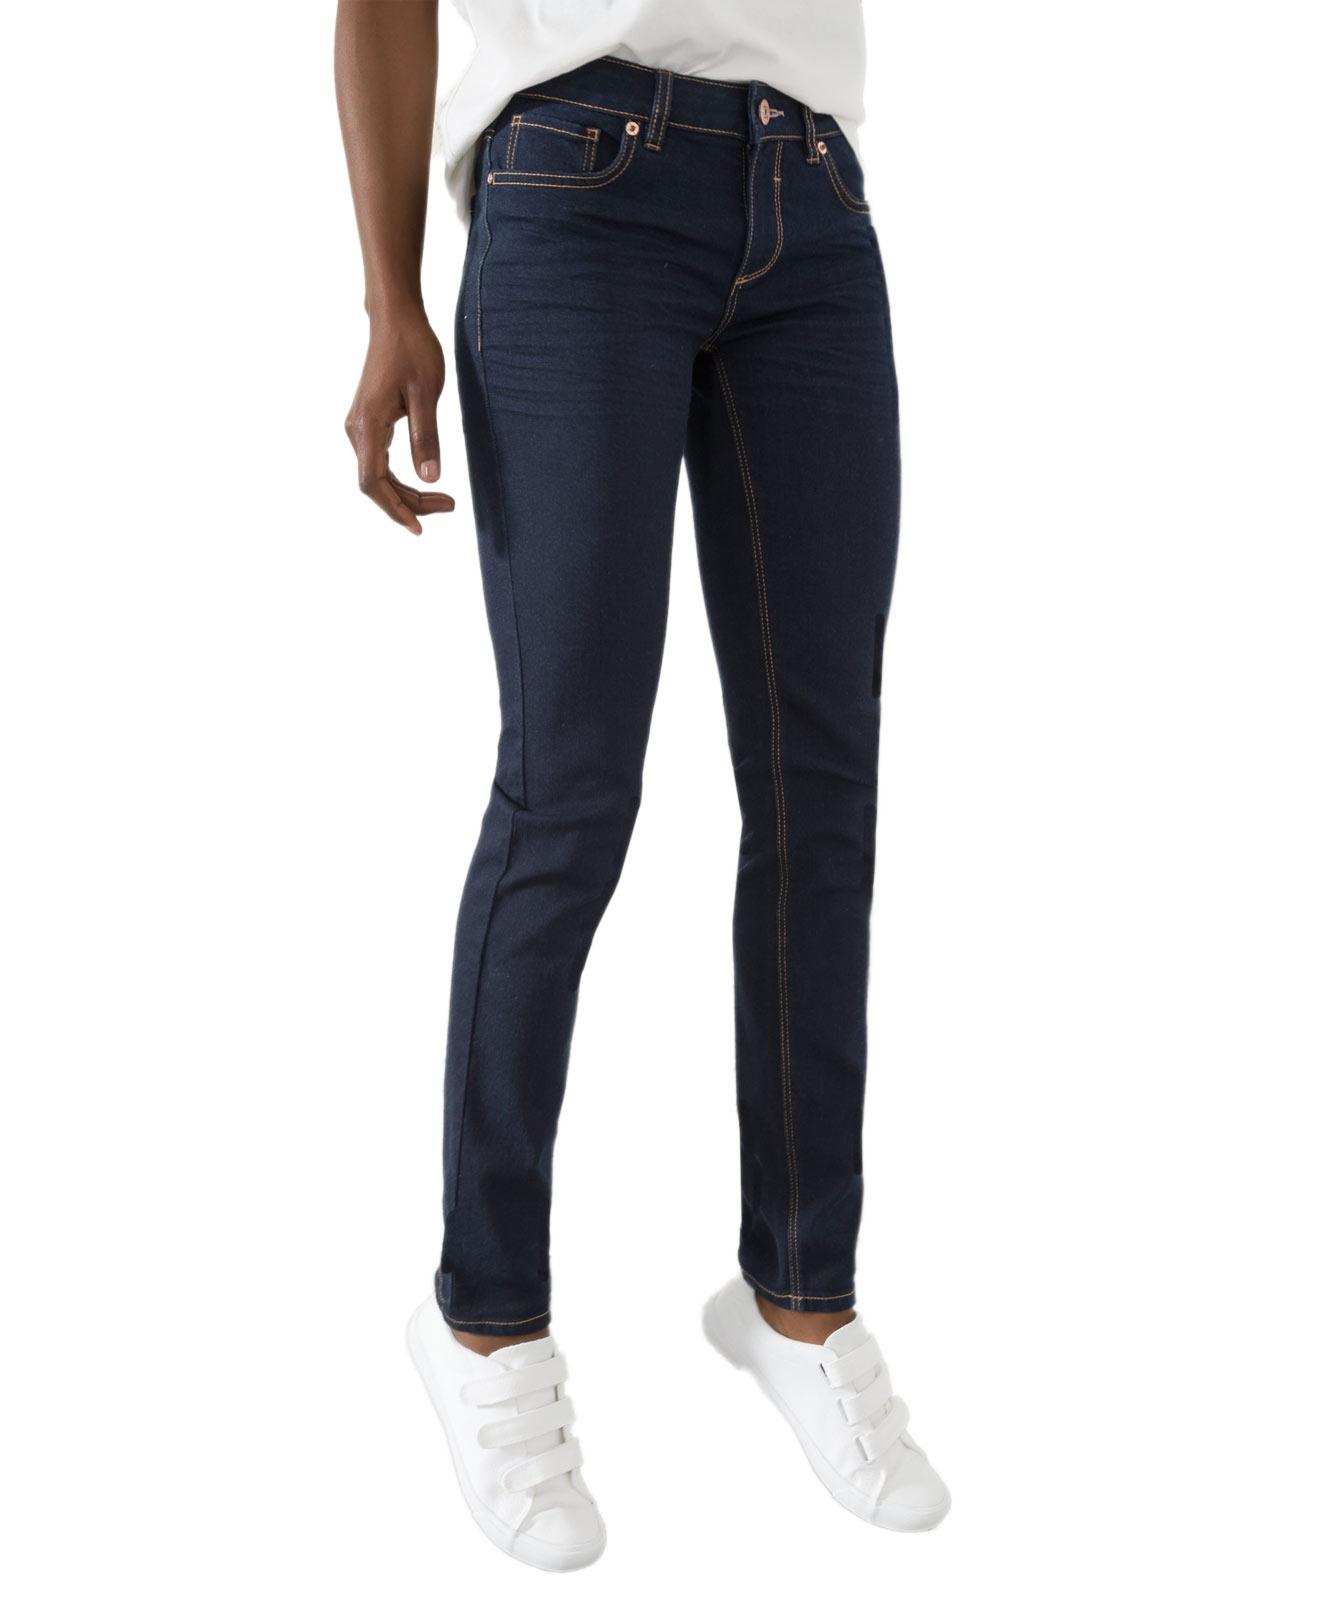 Hosen für Frauen - HIS MONROE Jeans Skinny Fit Pure Rinse  - Onlineshop Jeans Meile